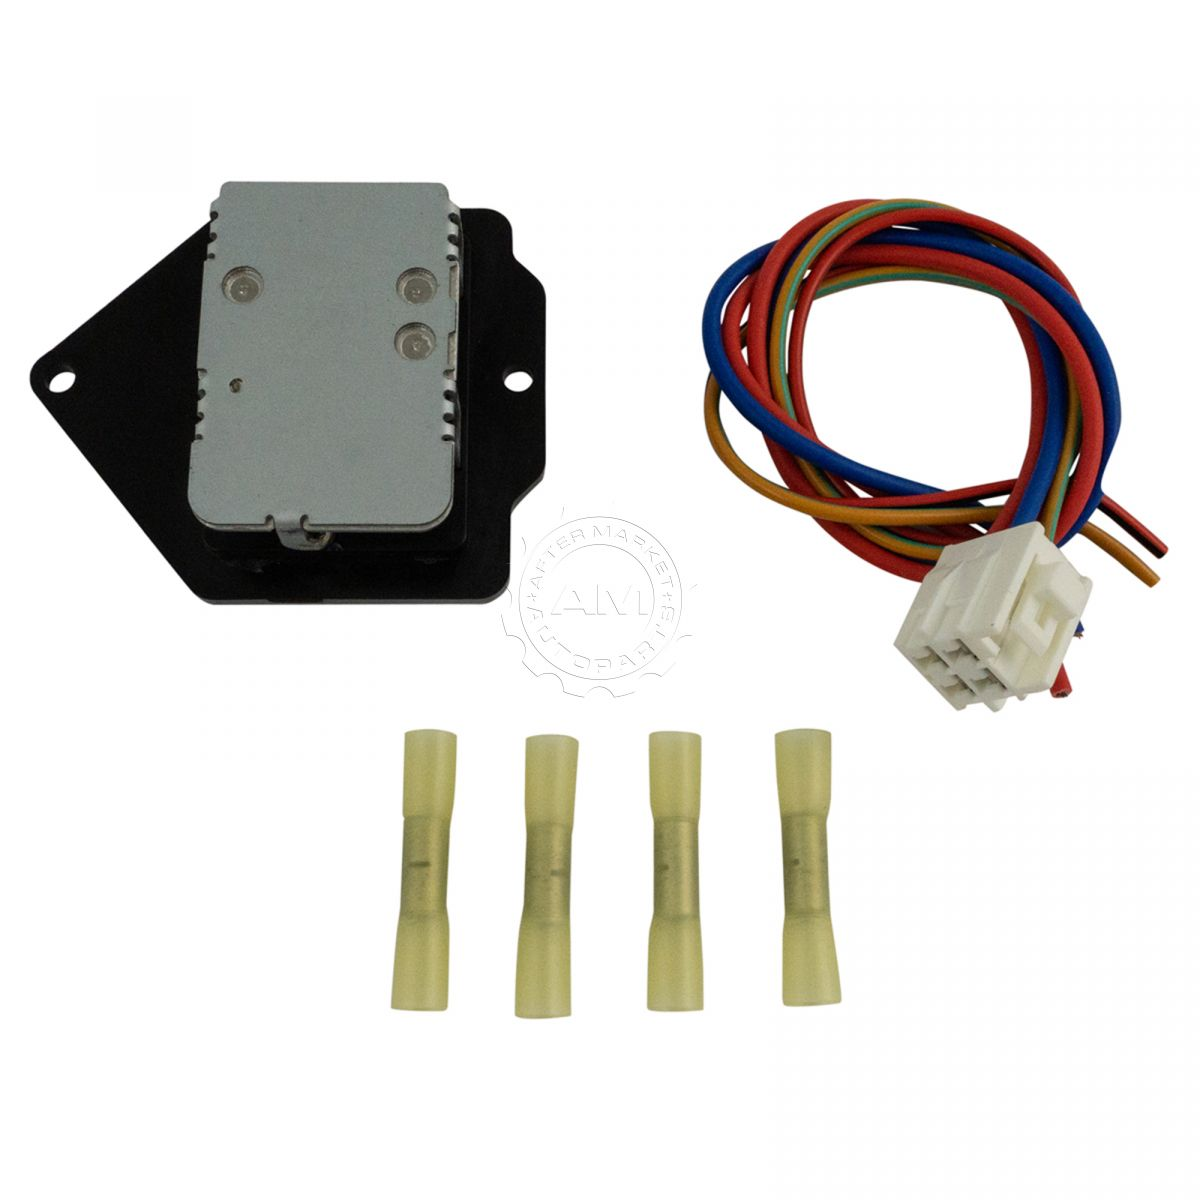 Dorman 973-5095 Heater AC Blower Motor Resistor w/ Harness for  International | eBayeBay